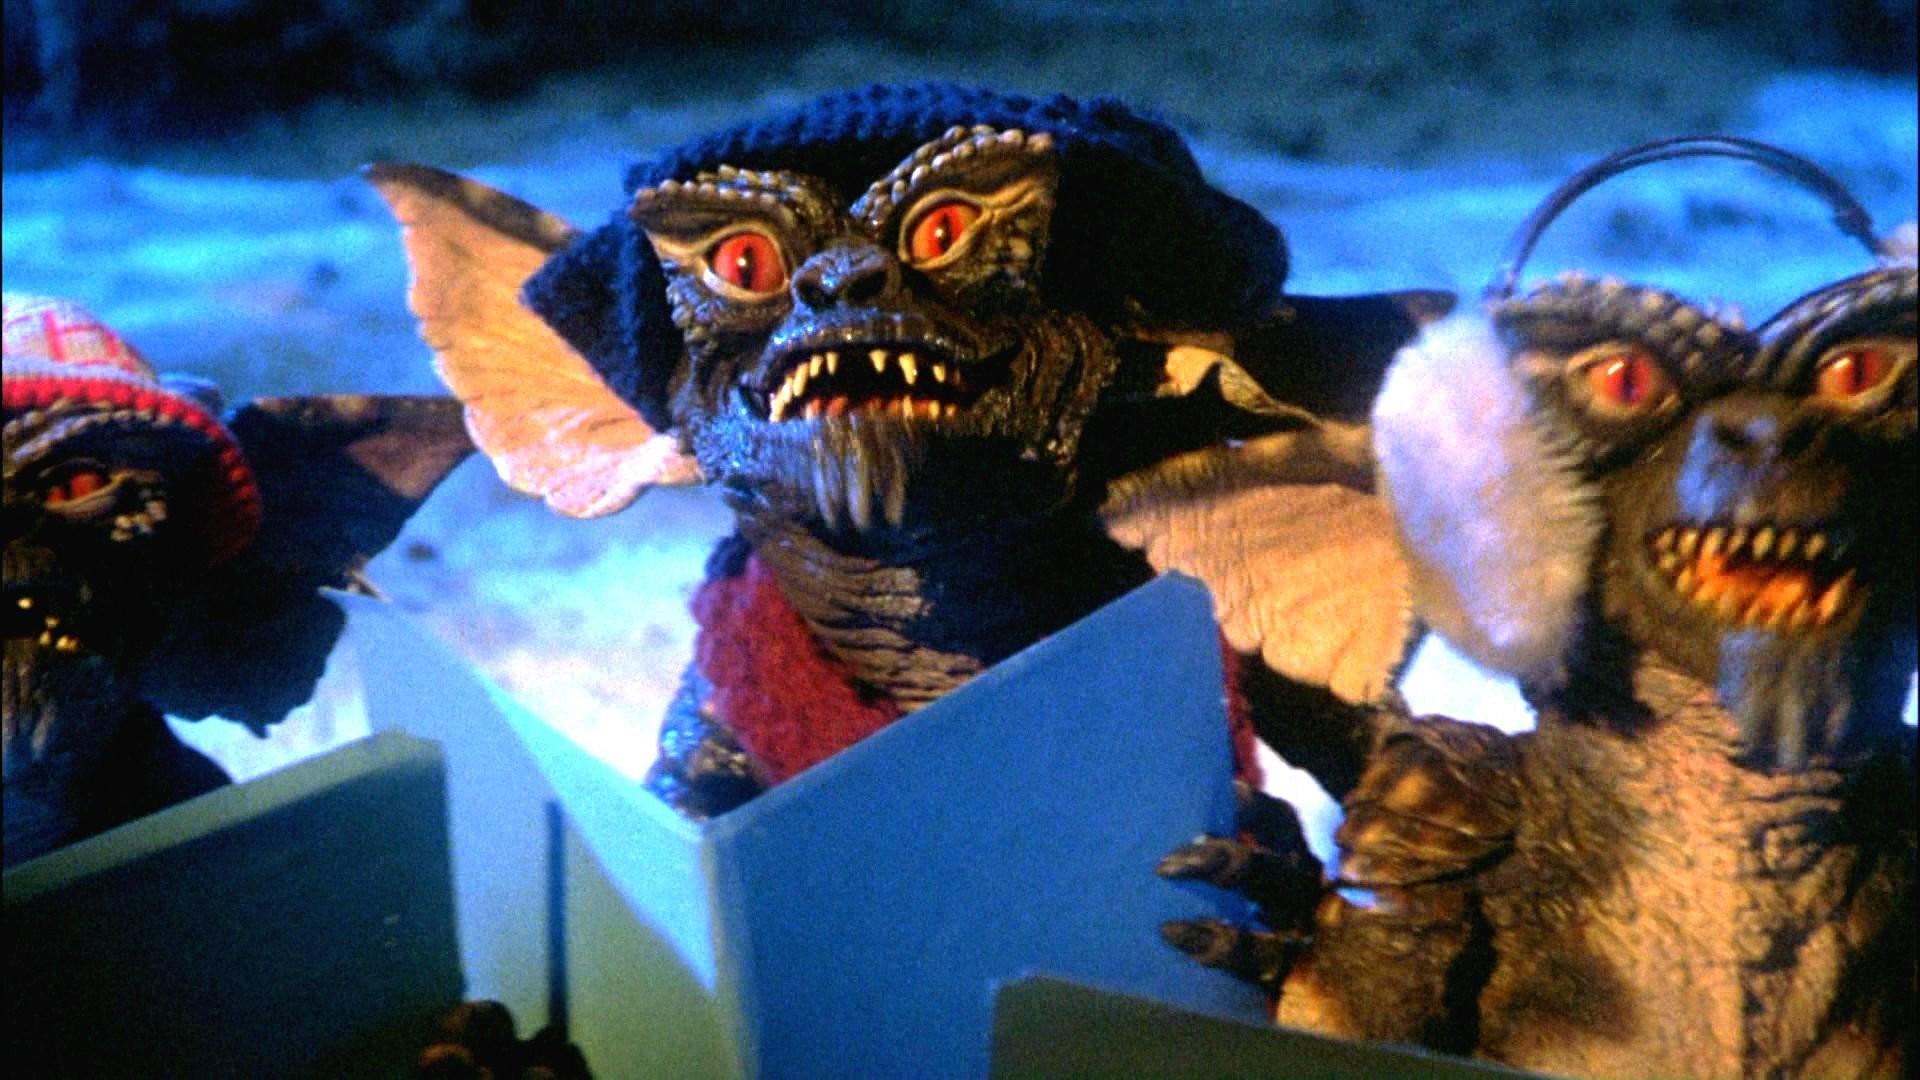 Res: 1920x1080, GREMLINS comedy horror creature monster alien (1) wallpaper |  |  252452 | WallpaperUP